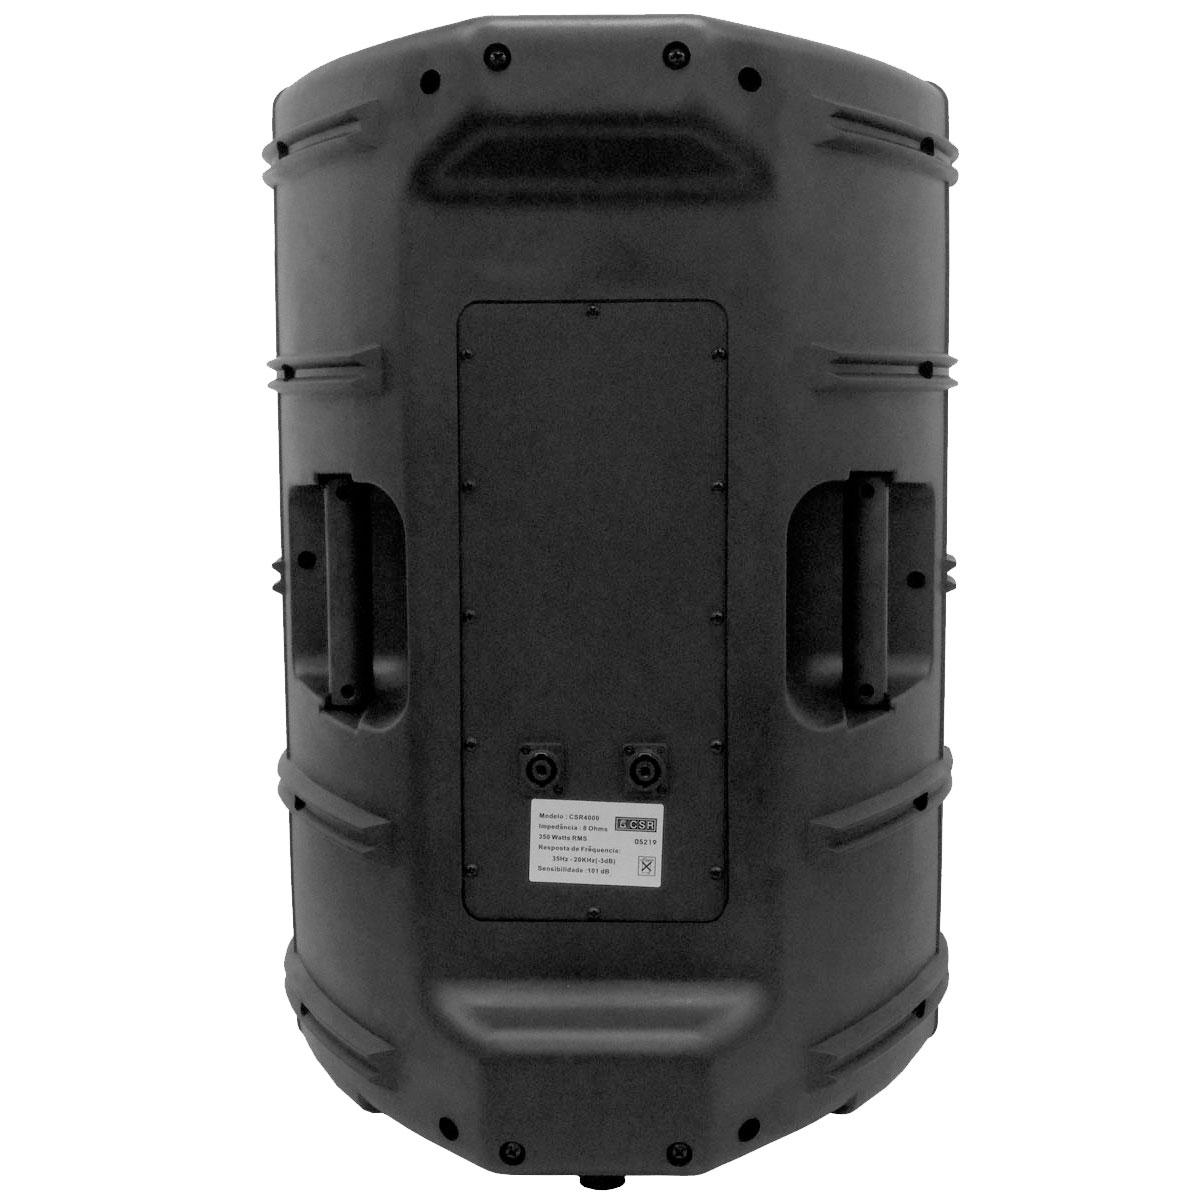 Caixa Passiva Fal 15 Pol 350w - CSR 4000